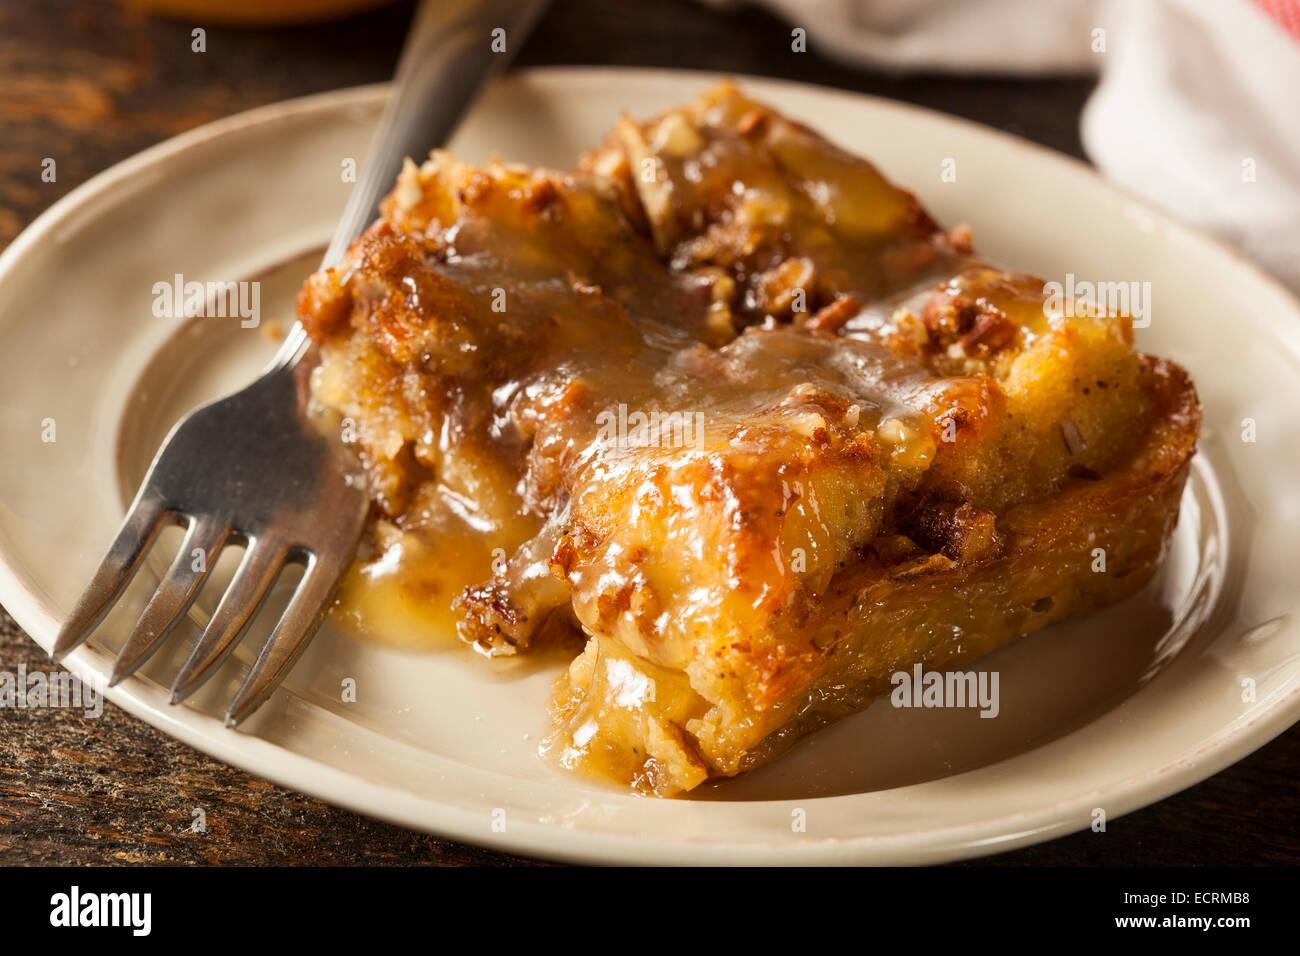 Sweet Pain Maison Dessert Pudding au vin rouge Photo Stock